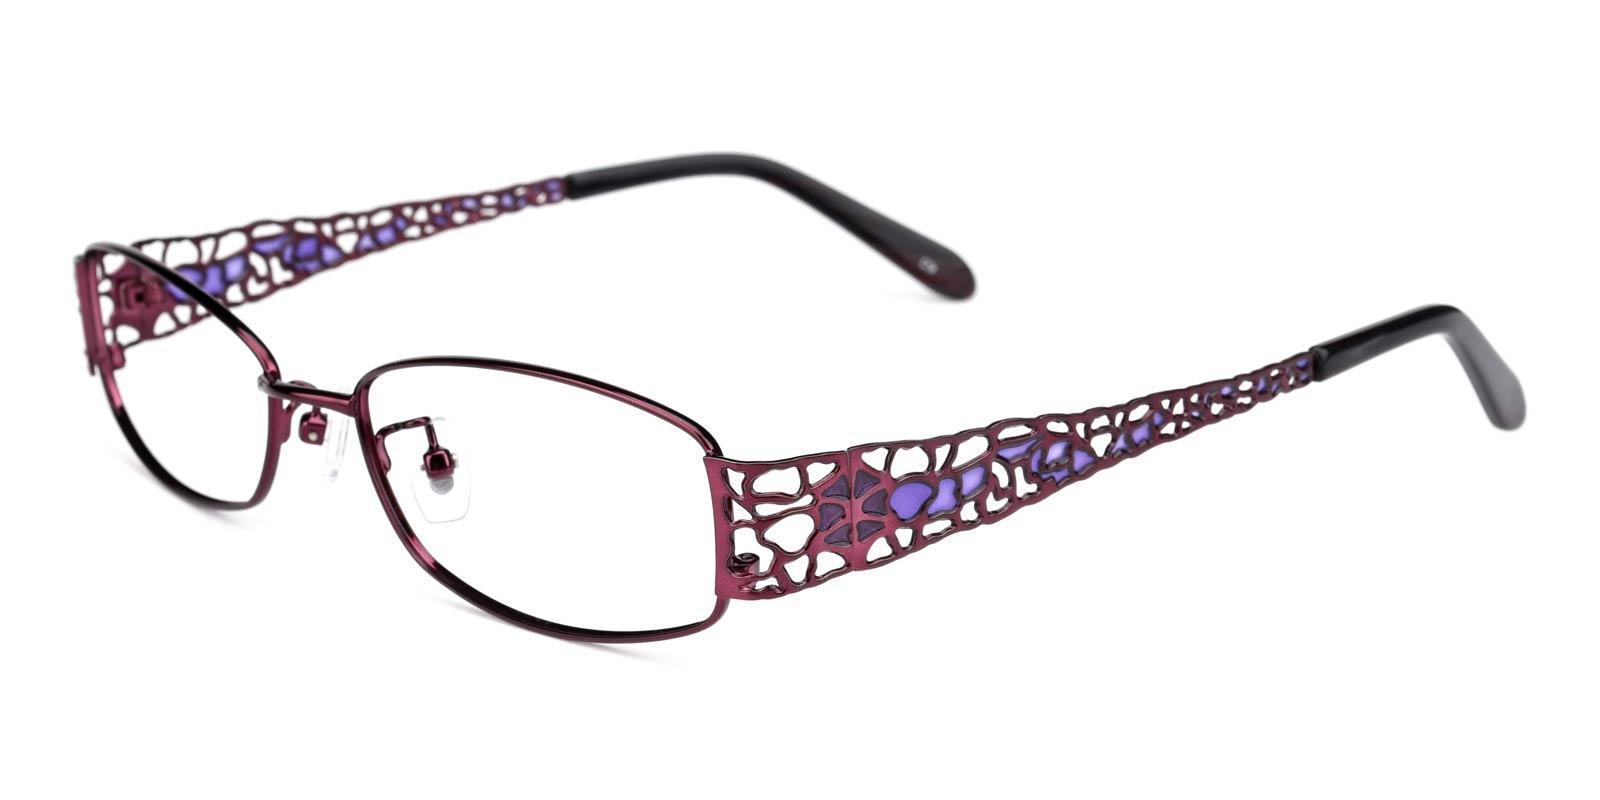 Spider-Purple-Rectangle-Metal-Eyeglasses-detail